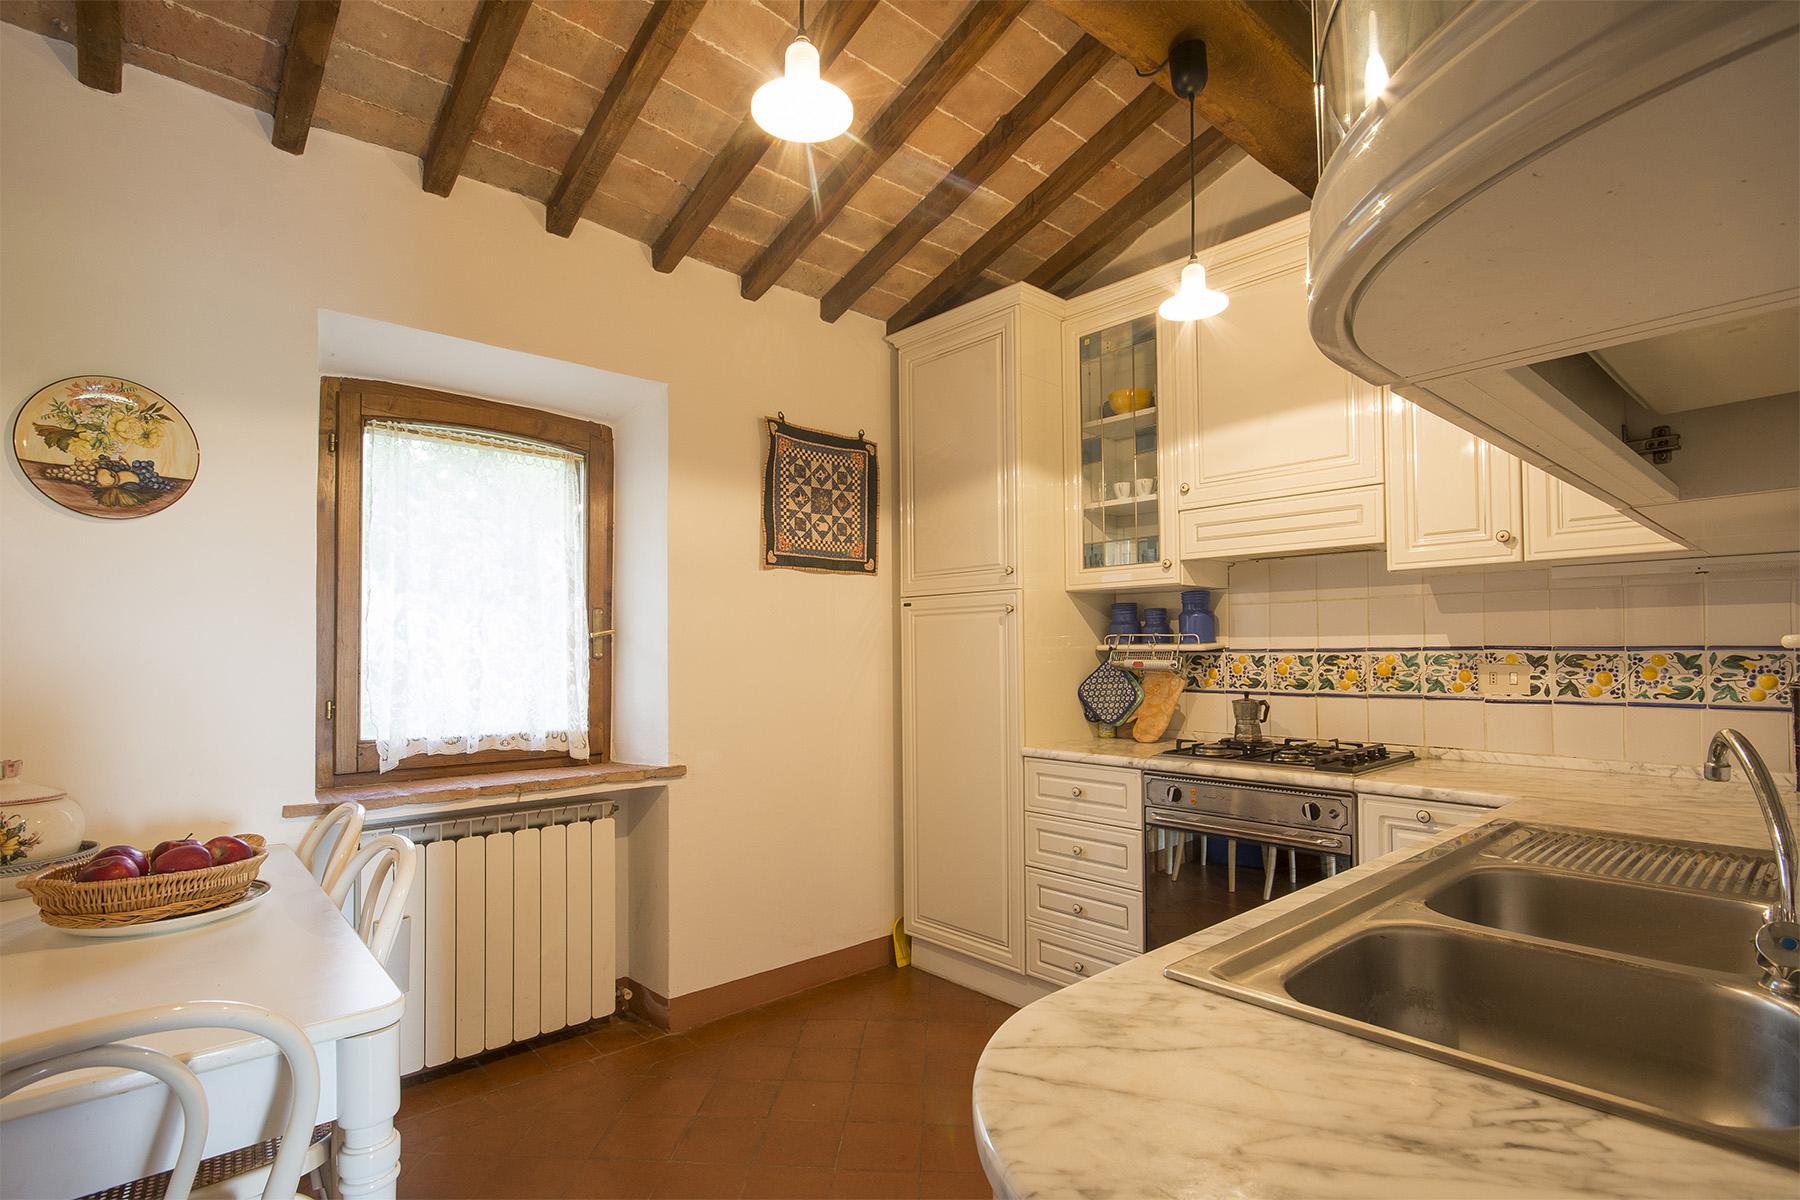 Casa indipendente in Vendita a Pienza: 5 locali, 400 mq - Foto 25